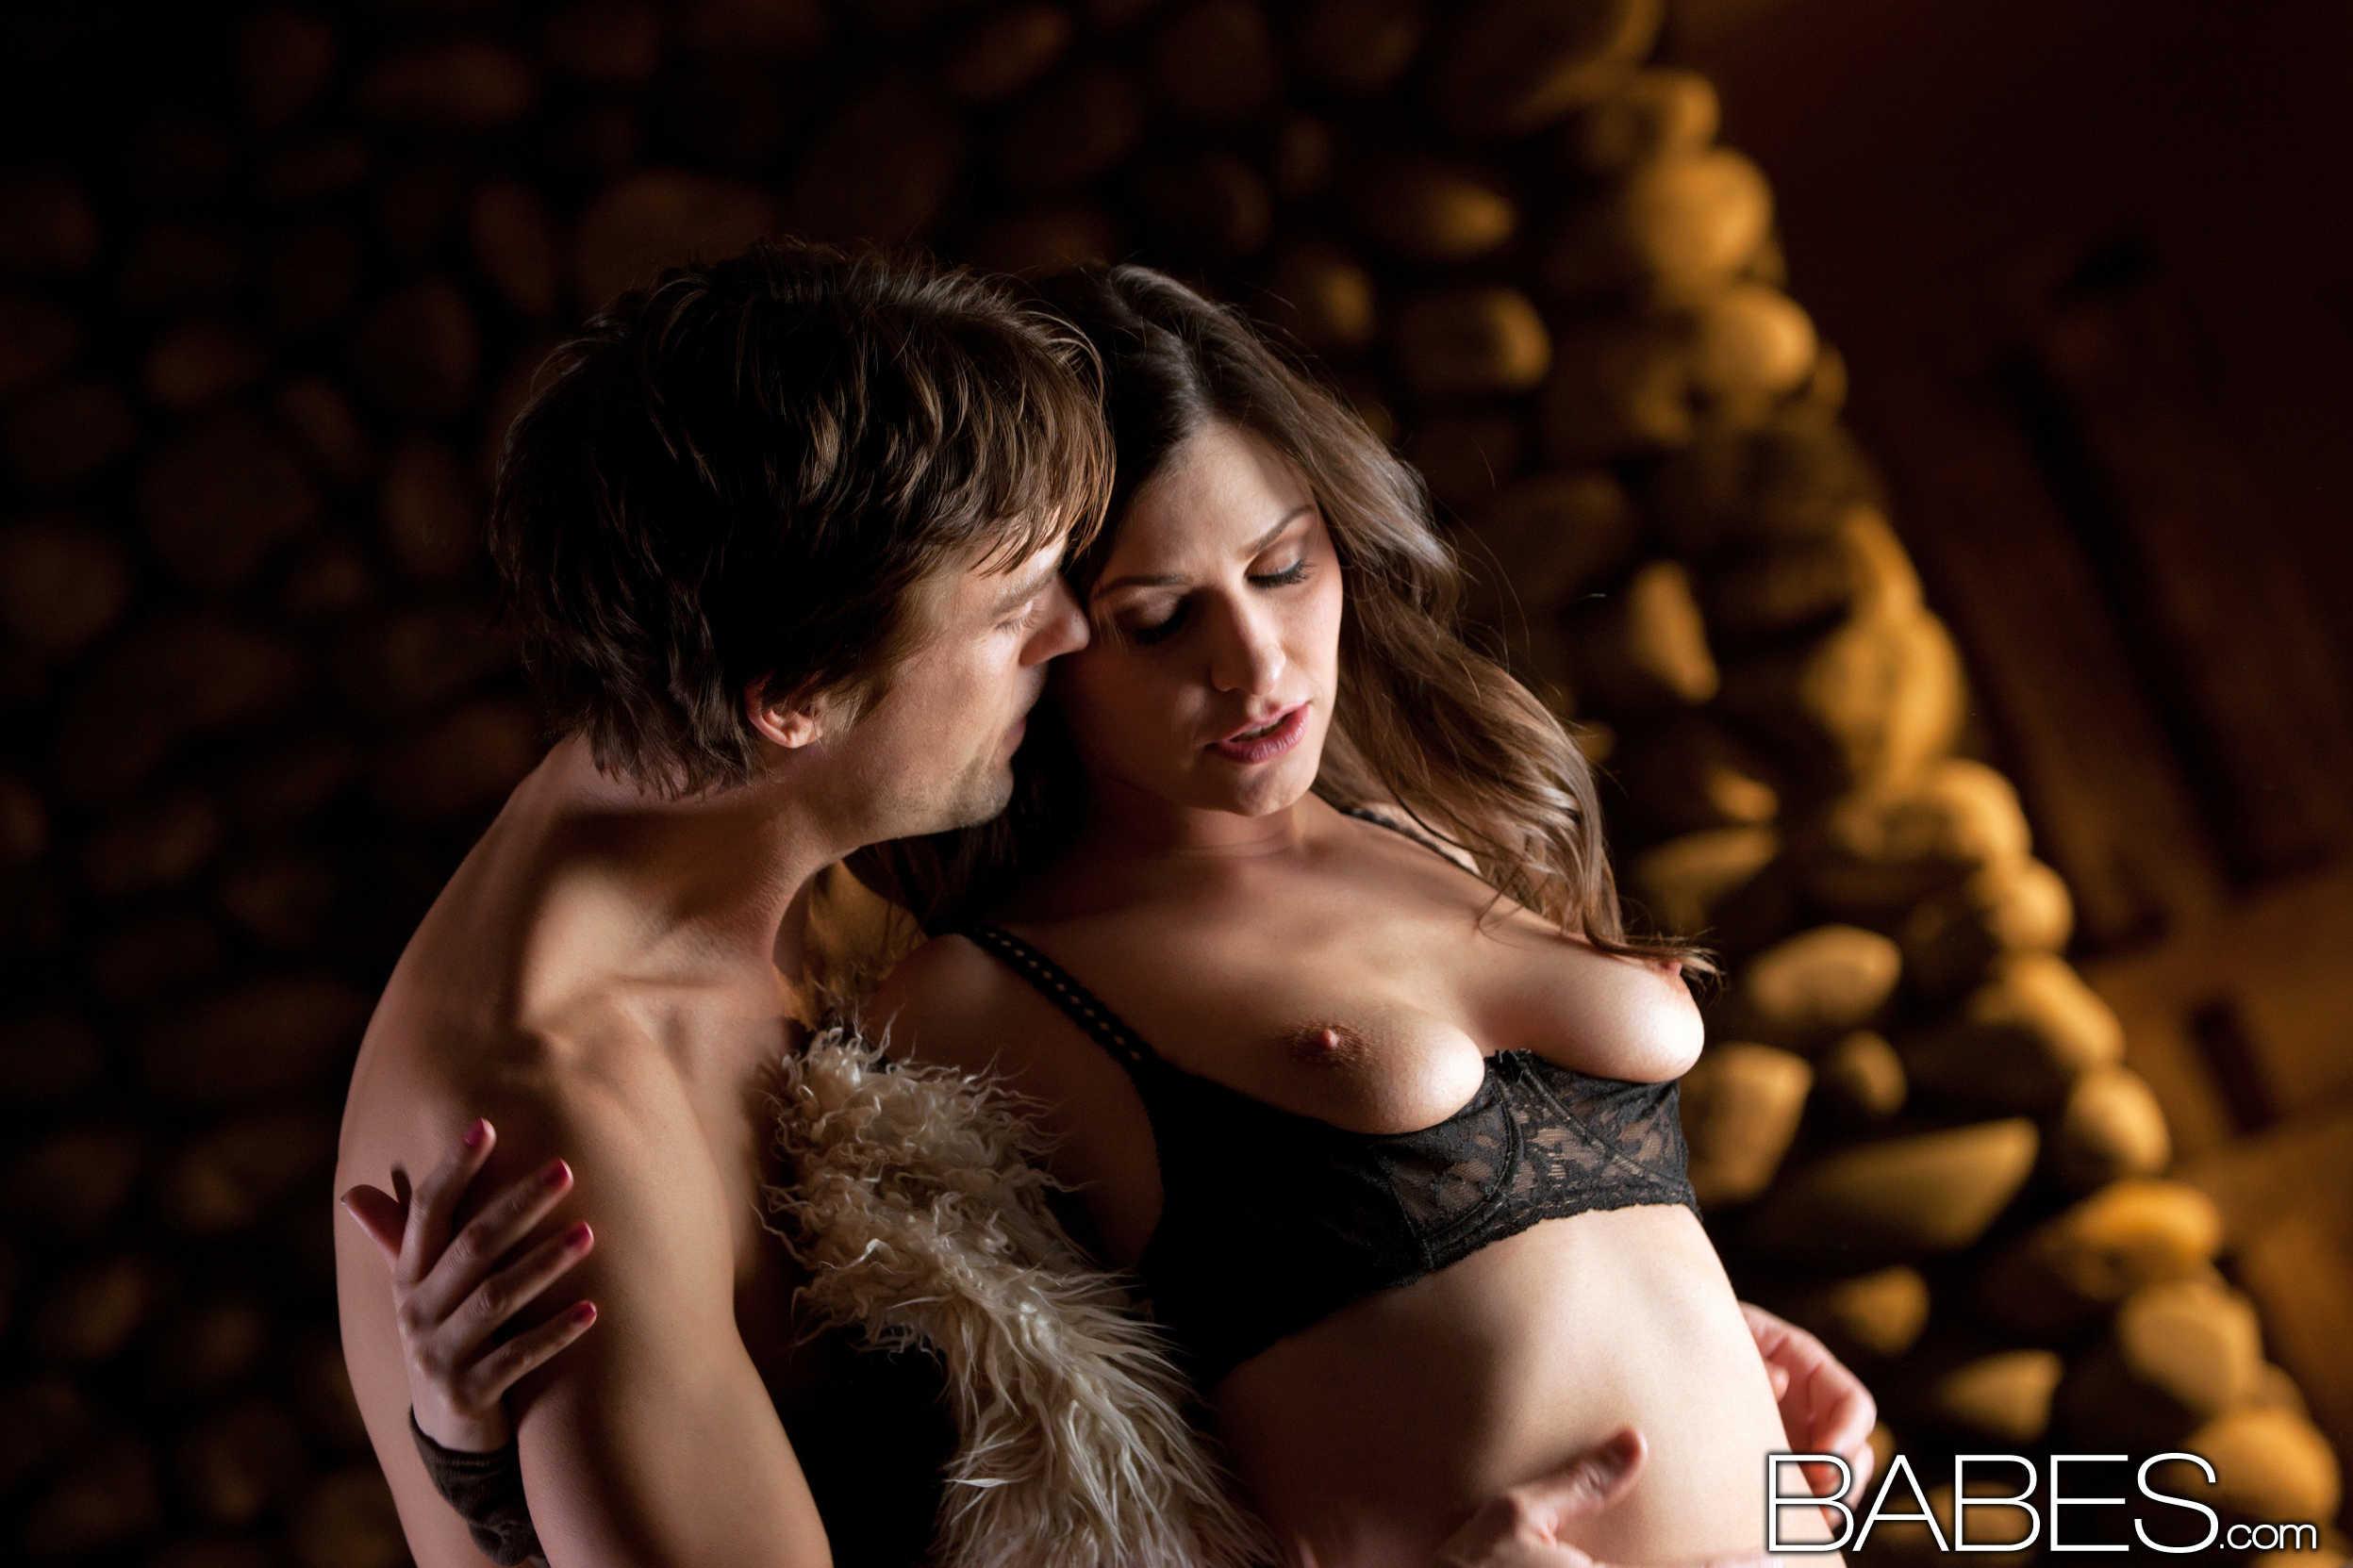 Babescom after dark romance victoria lawson 9